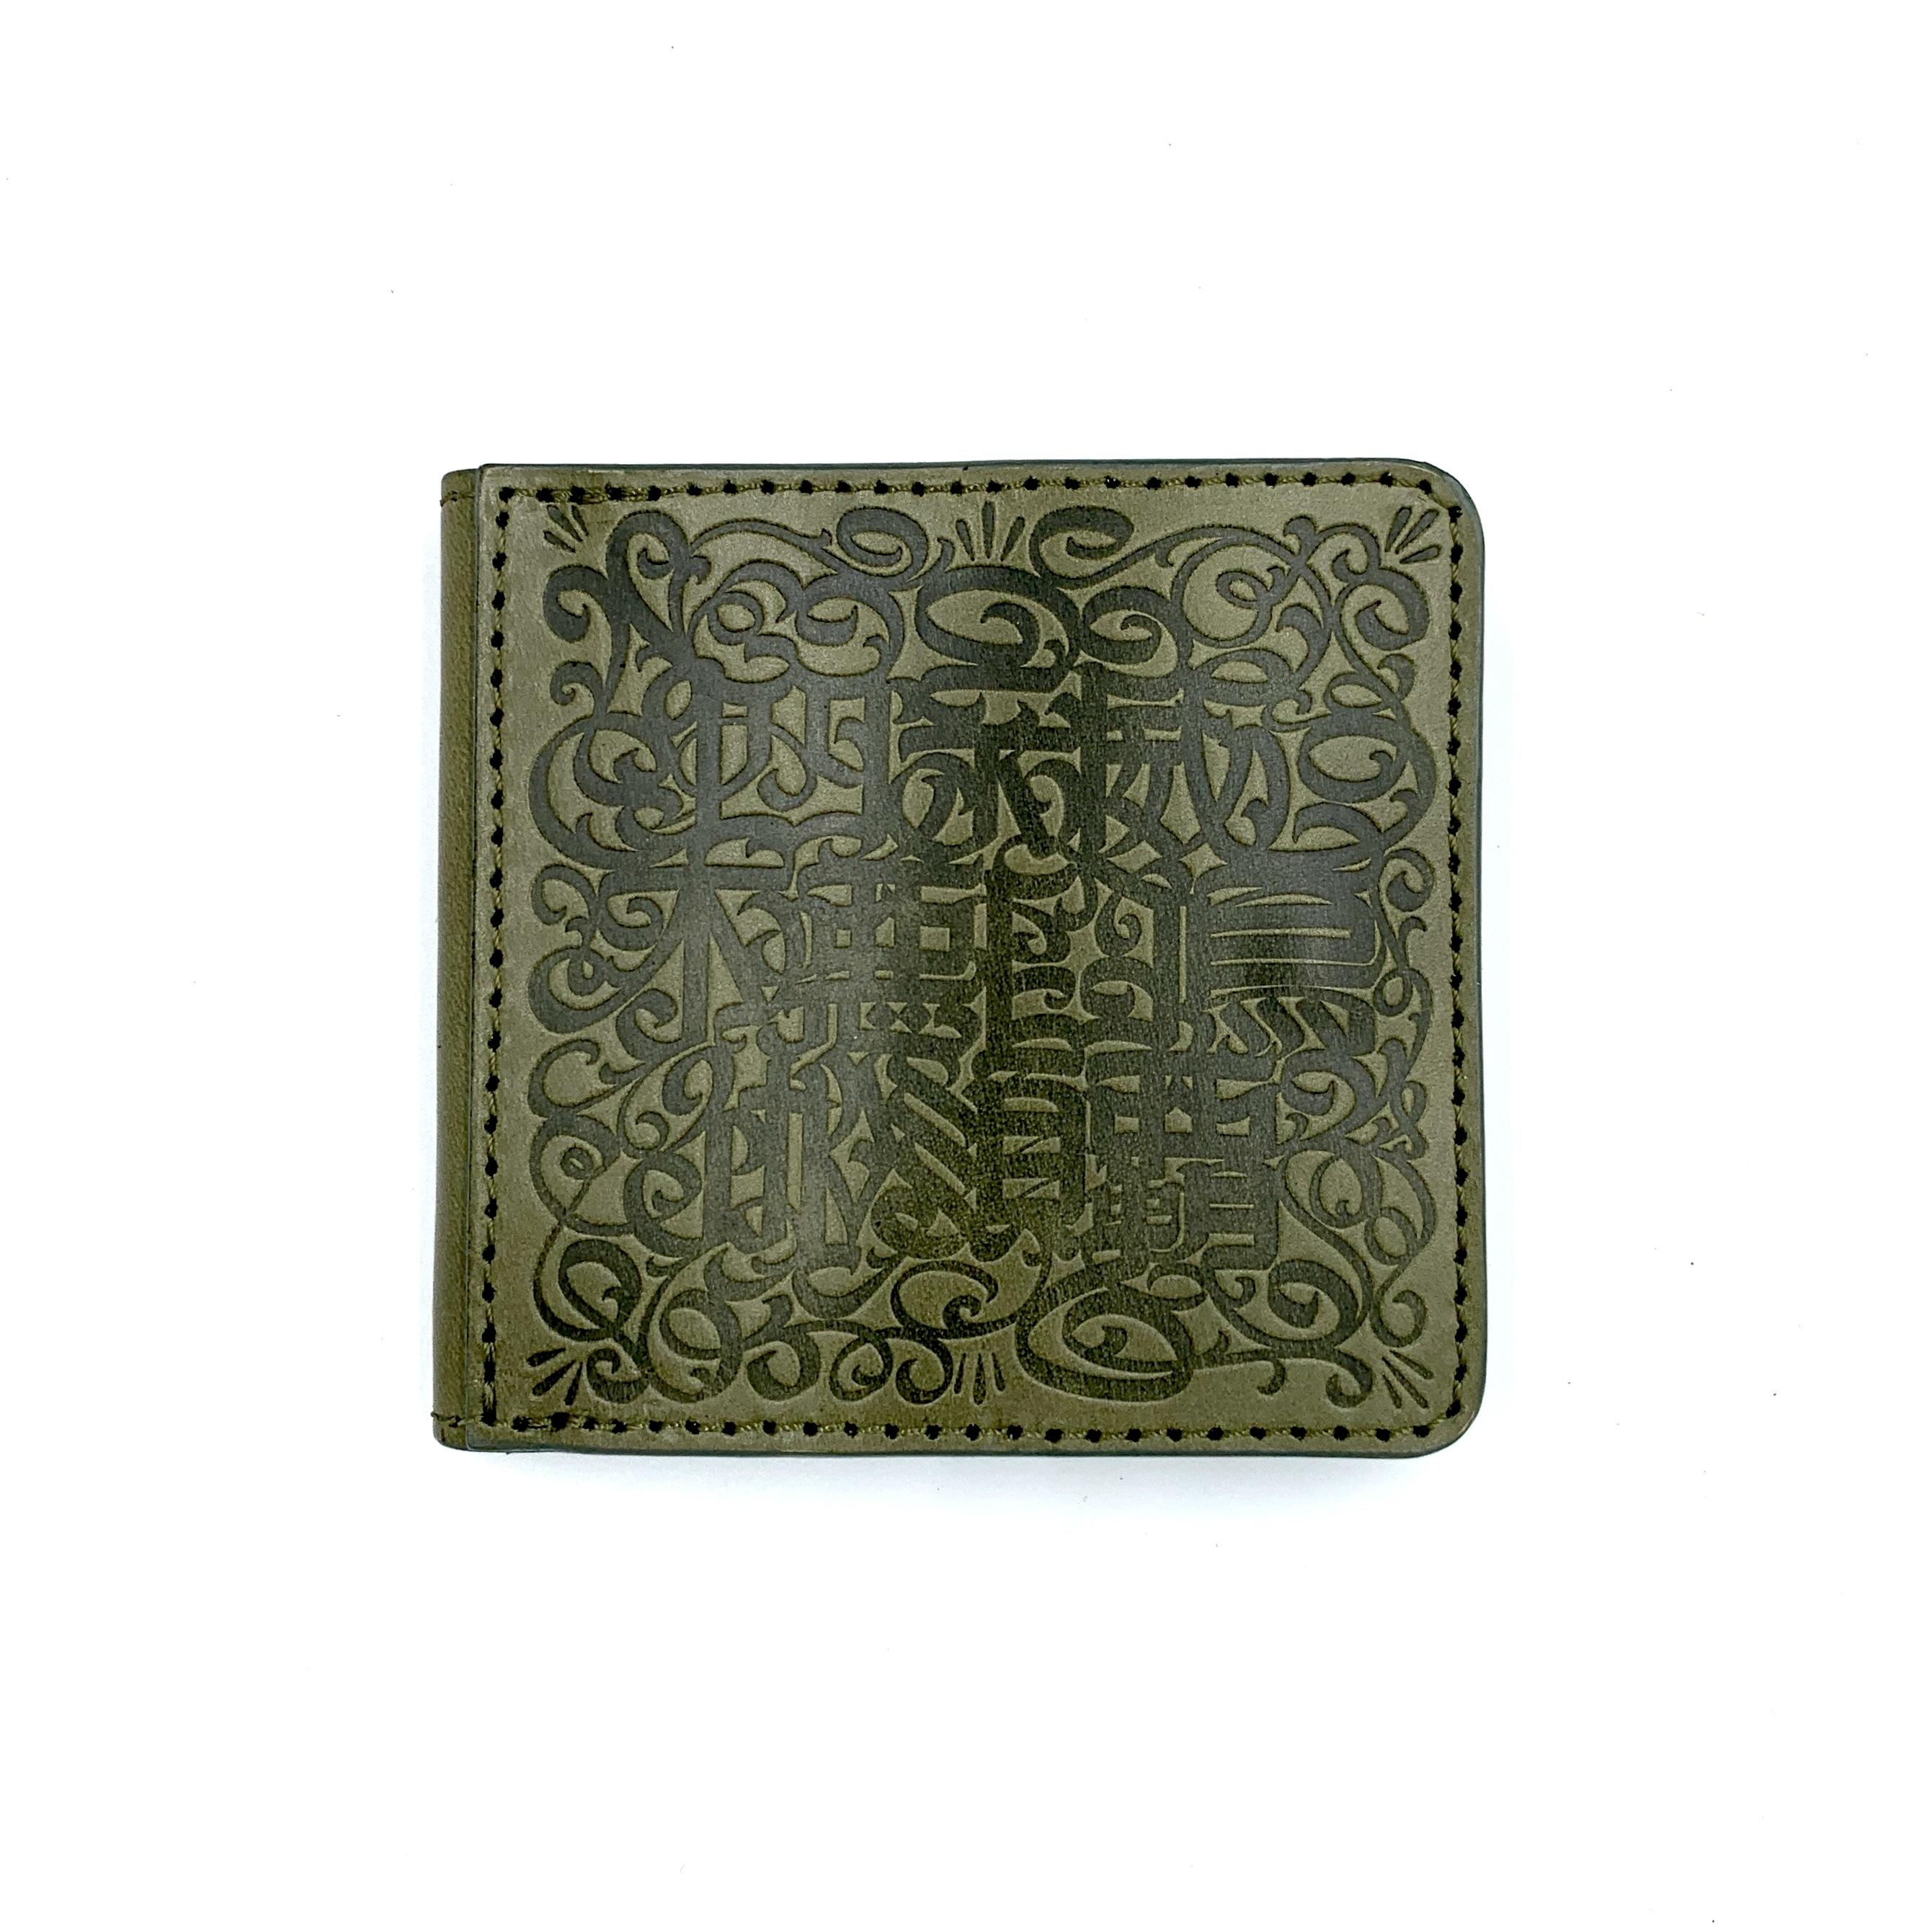 《CASPER× YONZY factory》BOX小銭入れショート財布 グリーン